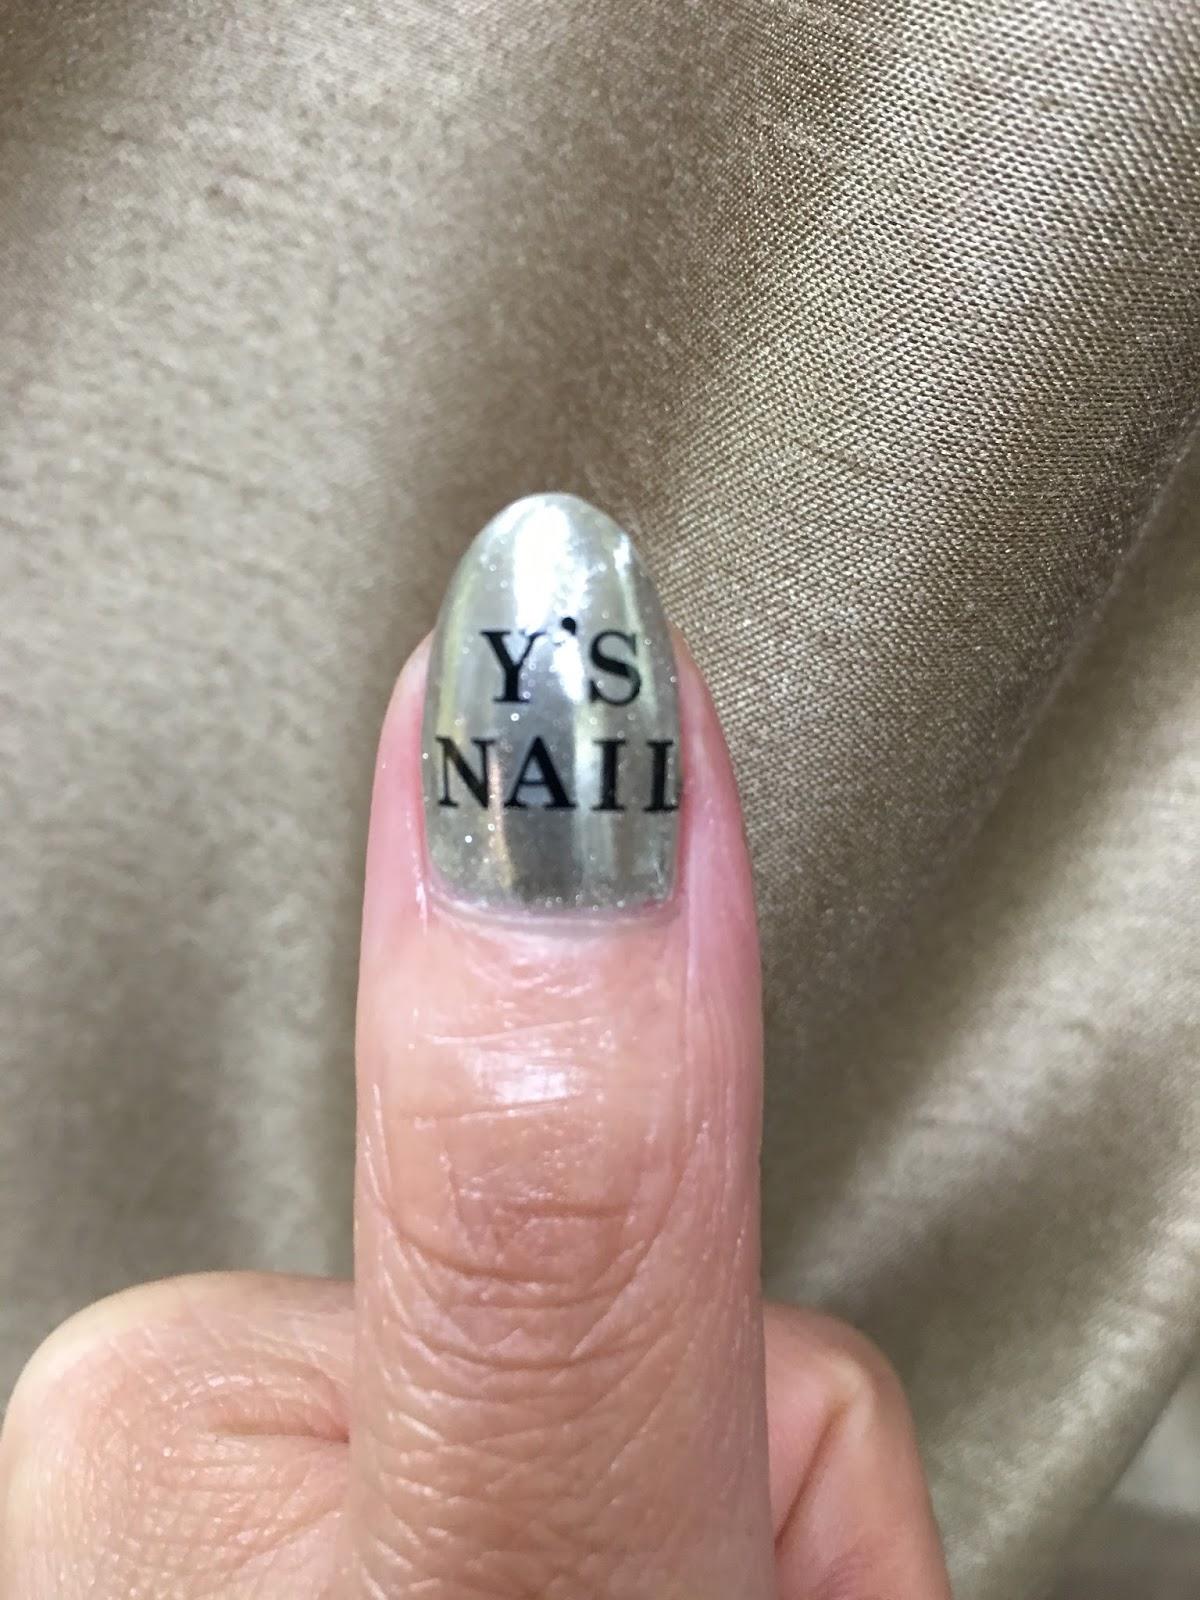 Ys Nail Blog January 2017